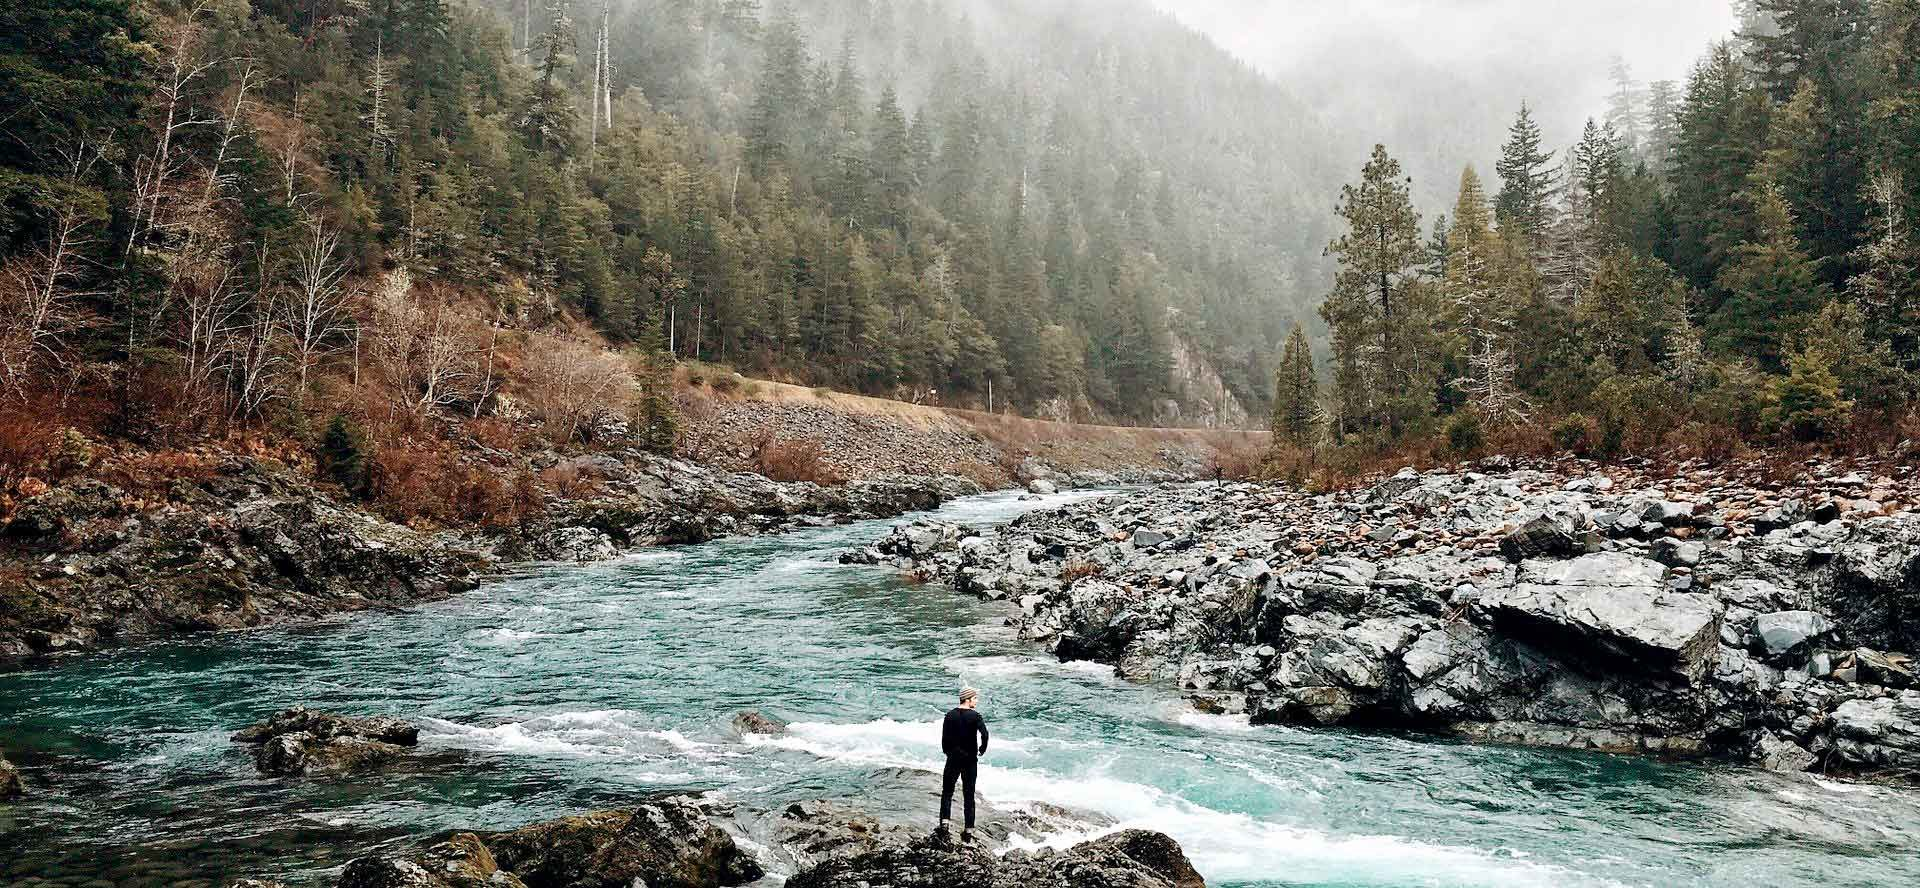 Viajeros Inspirando Viajeros: naturaleza al límite